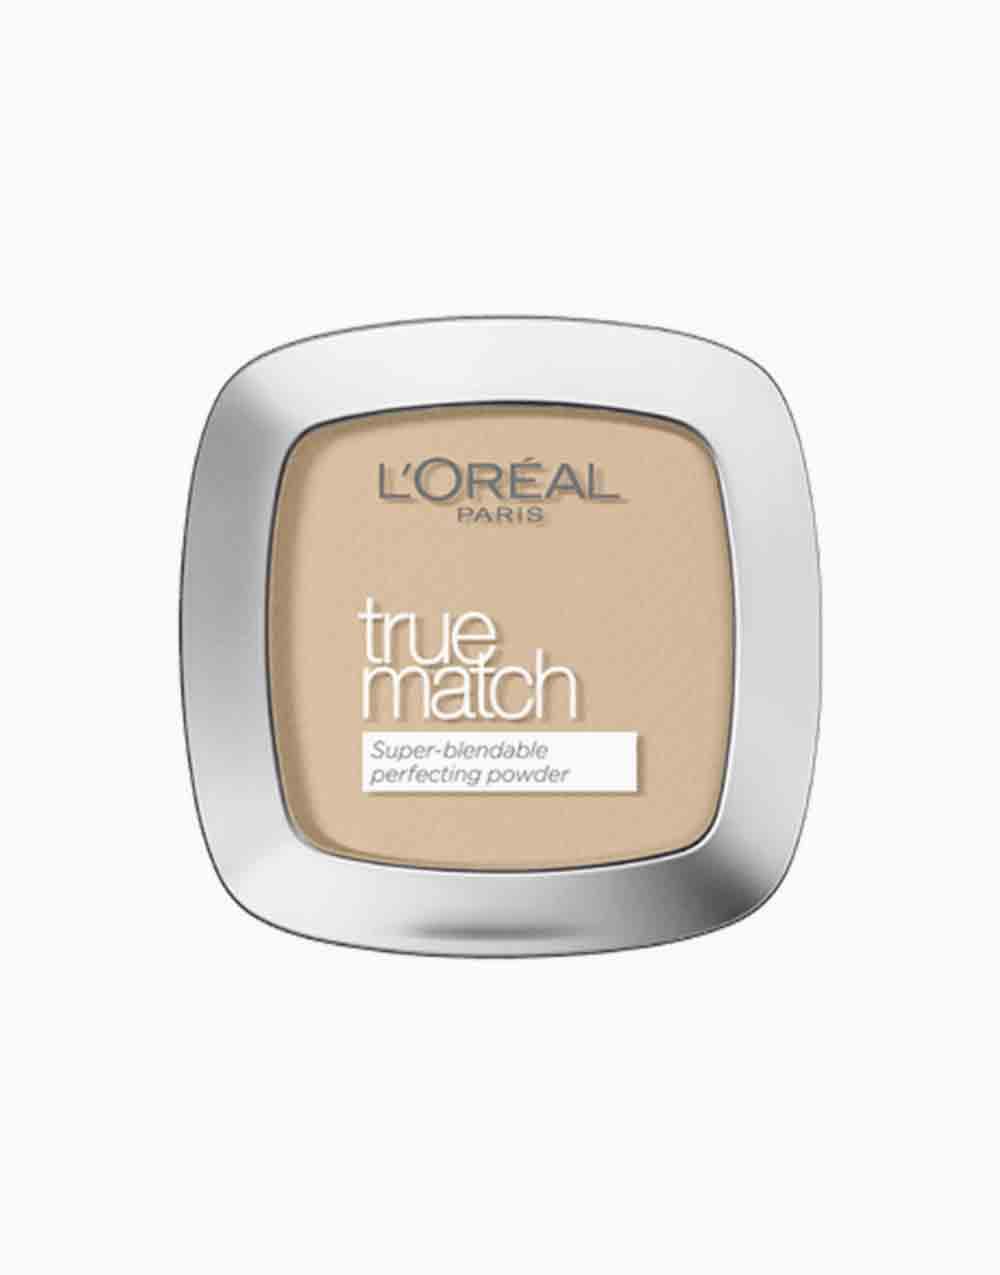 True Match Skin-Caring Skin-Matching Pressed Powder by L'Oréal Paris | 2N Vanilla